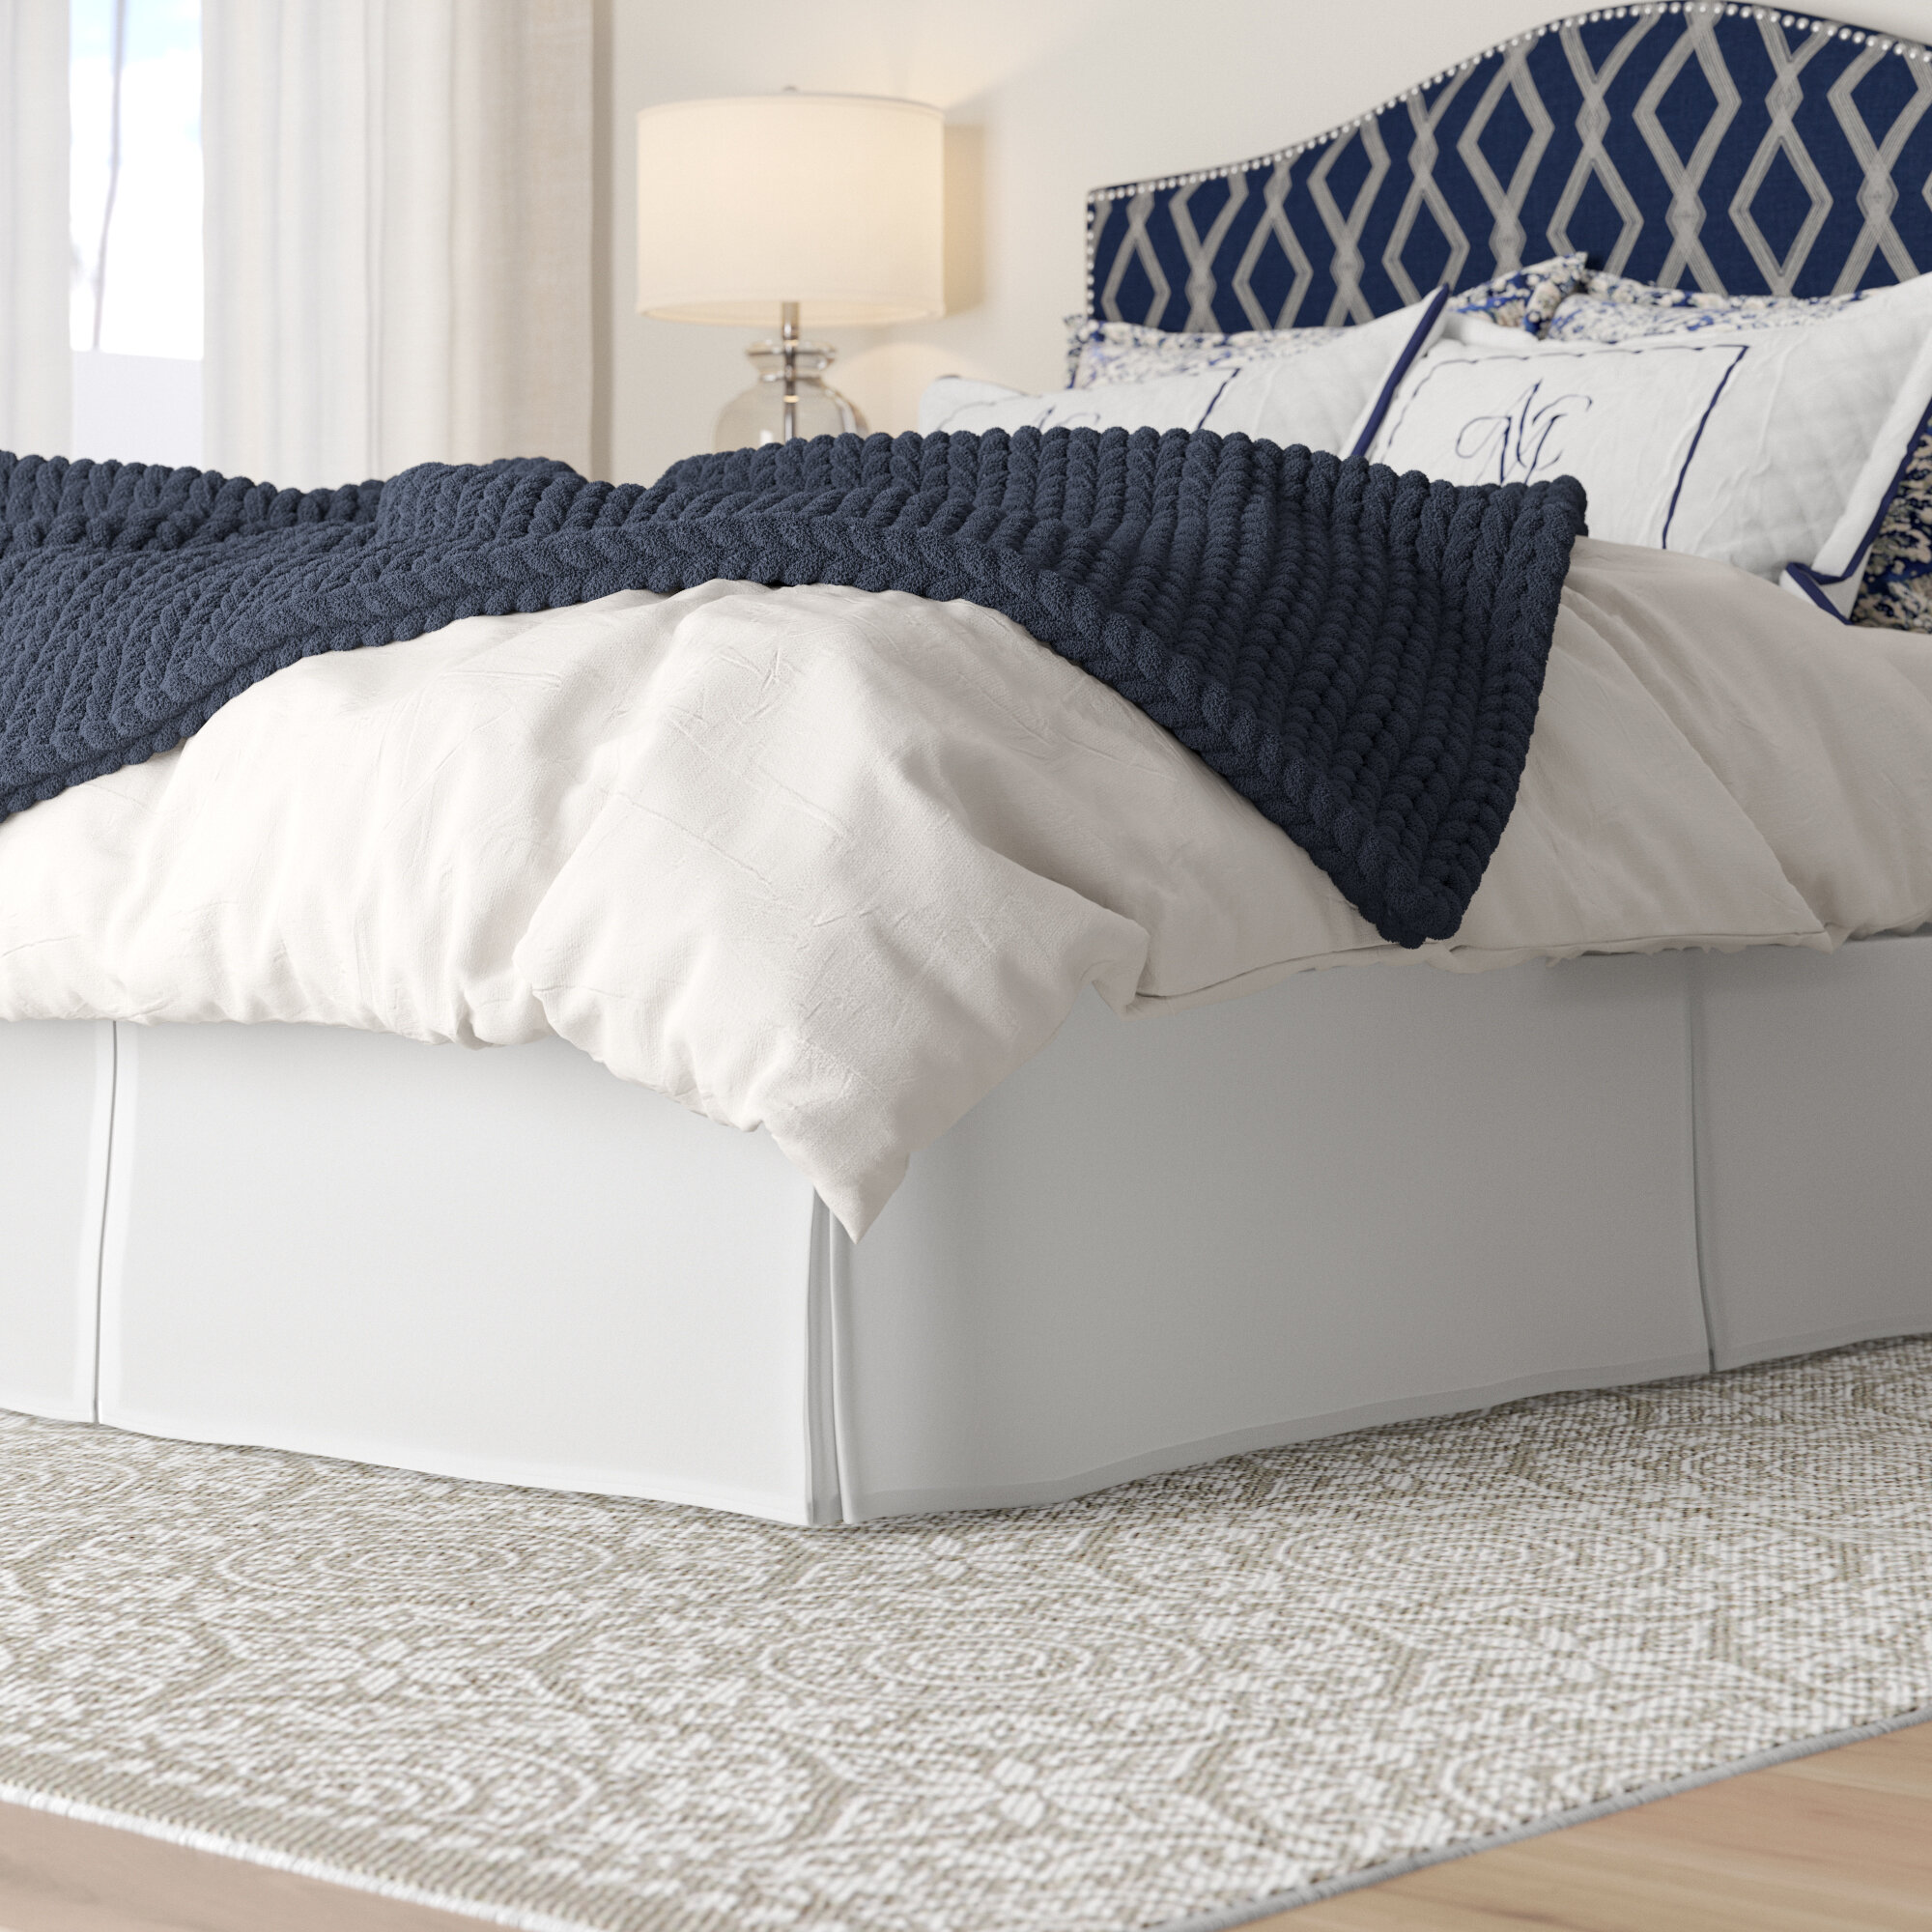 Alwyn Home Chavez 16 Bed Skirt Reviews Wayfair